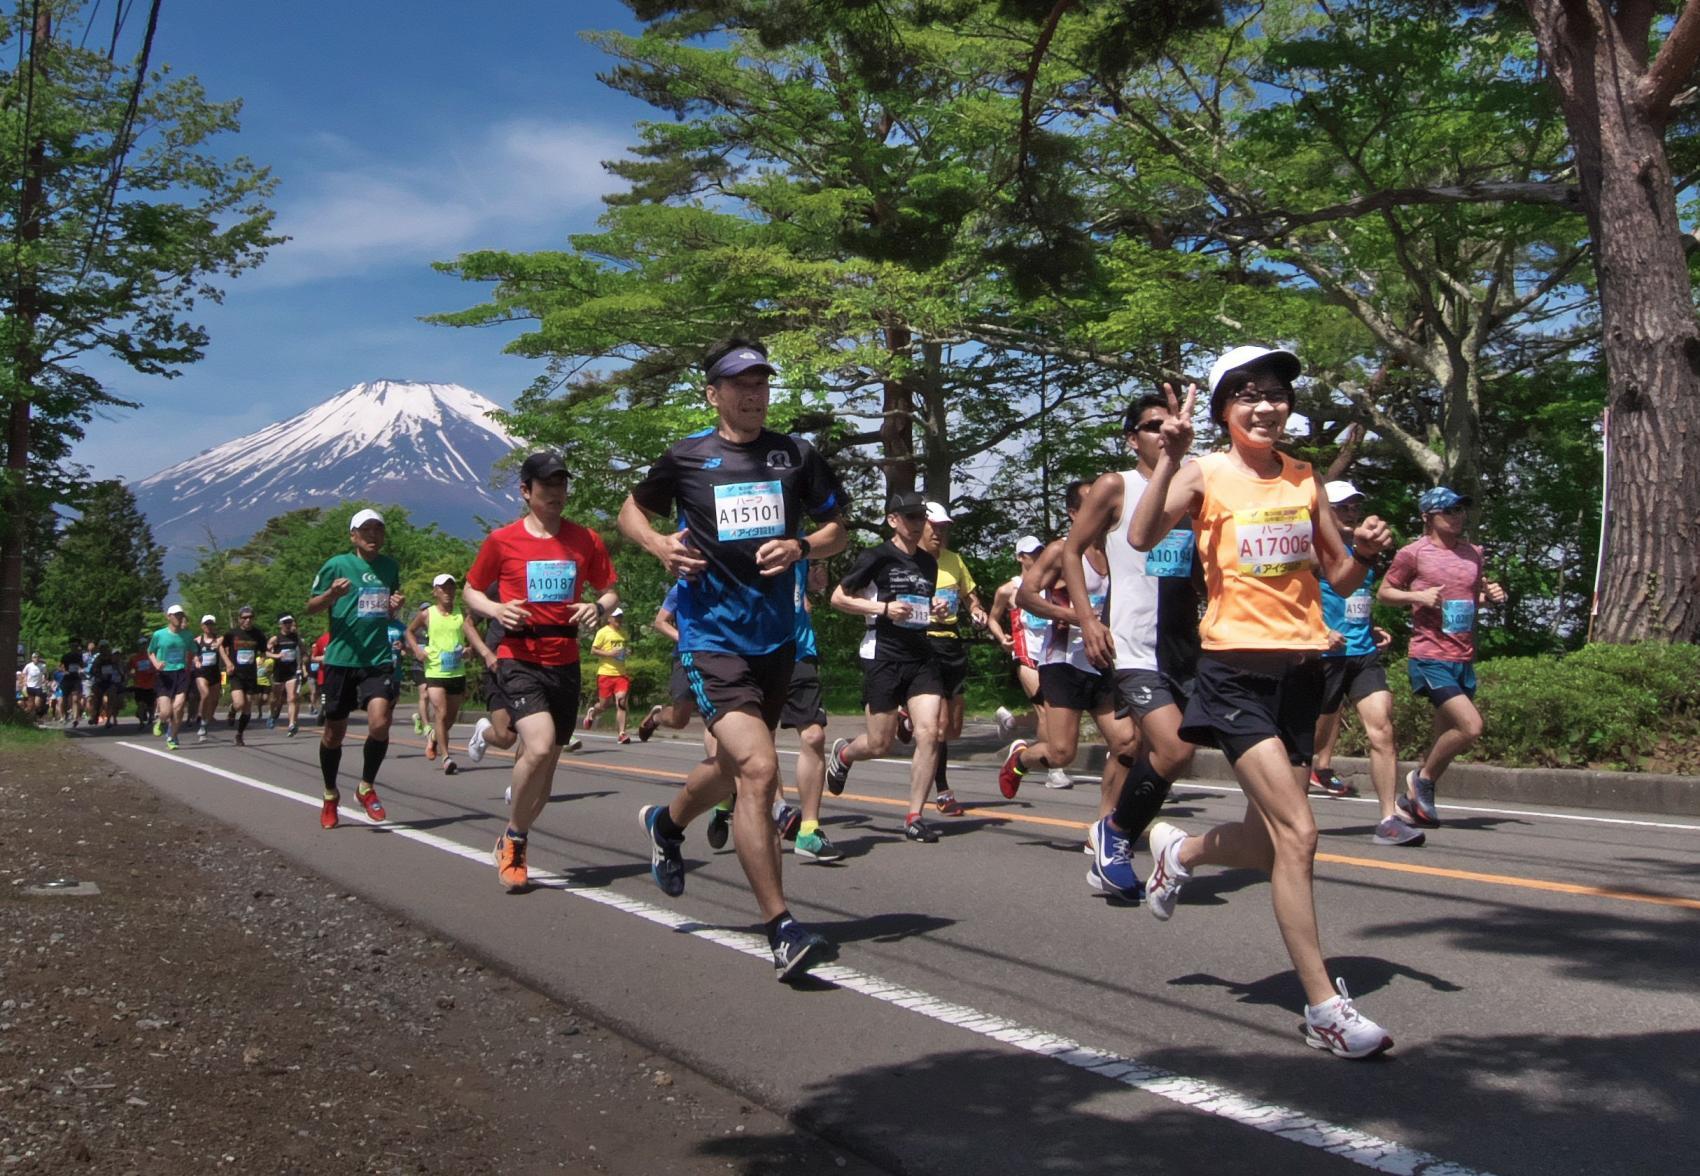 Lake Yamanaka road race held